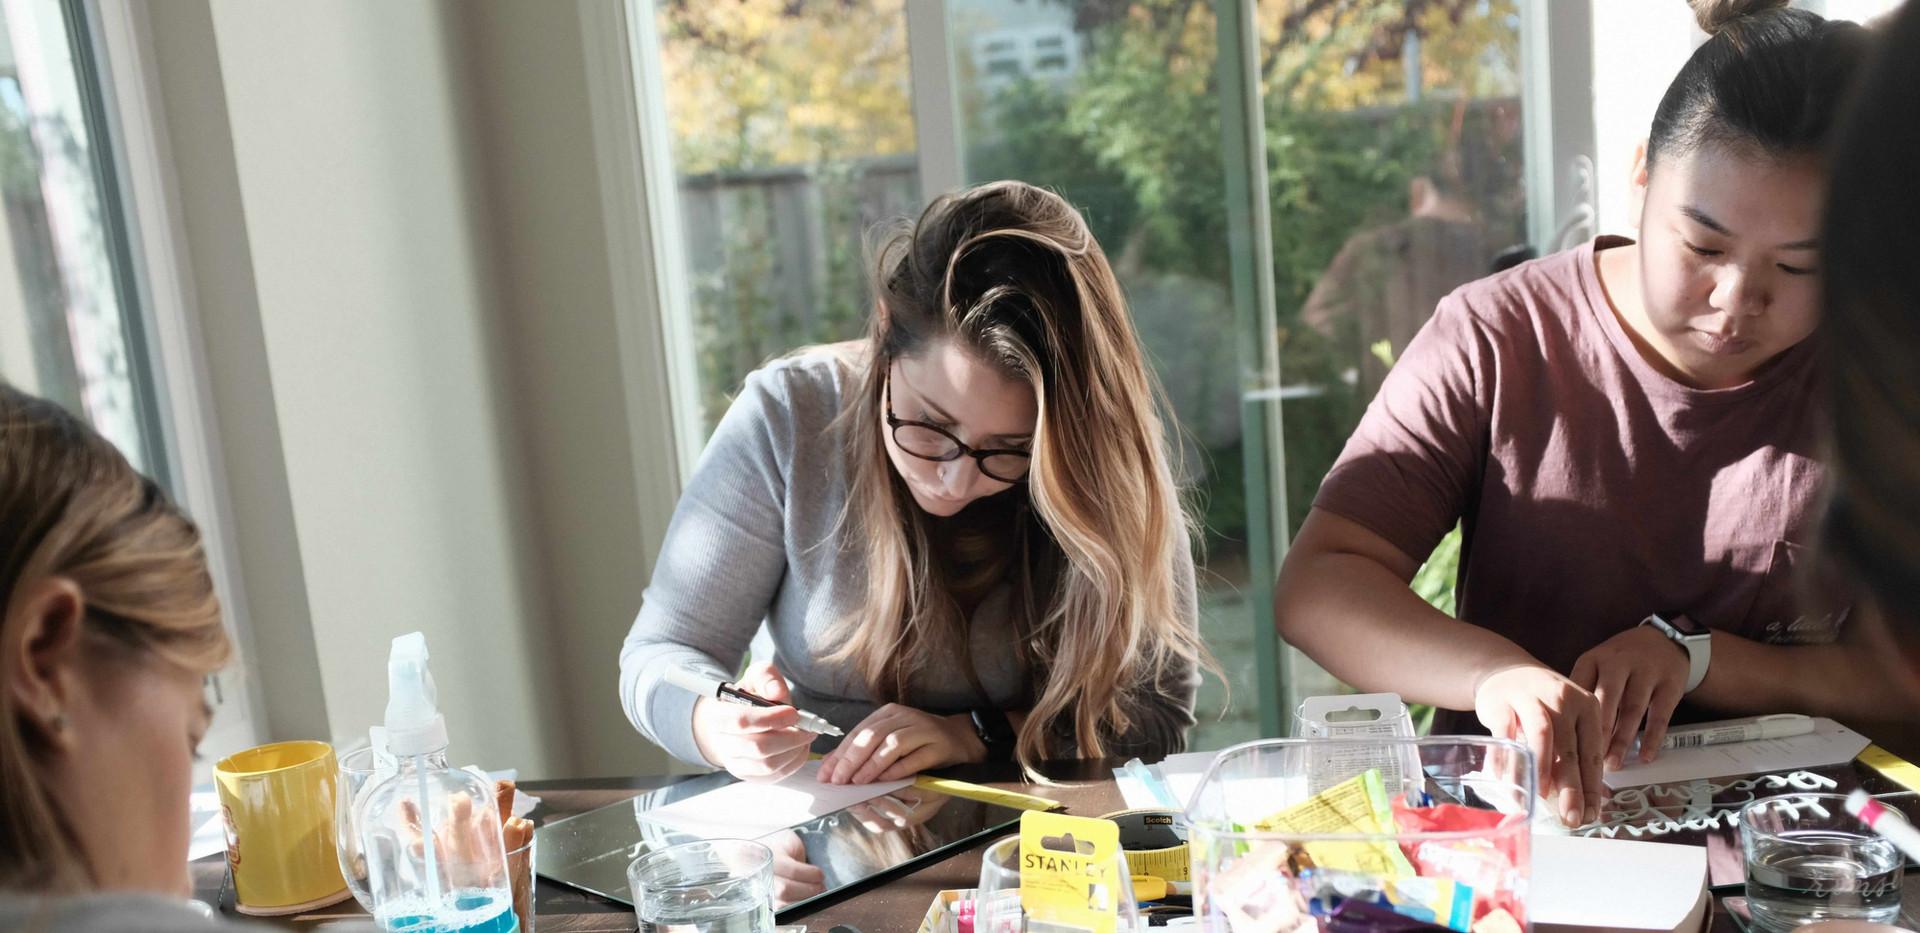 lettering-on-mirror-workshop